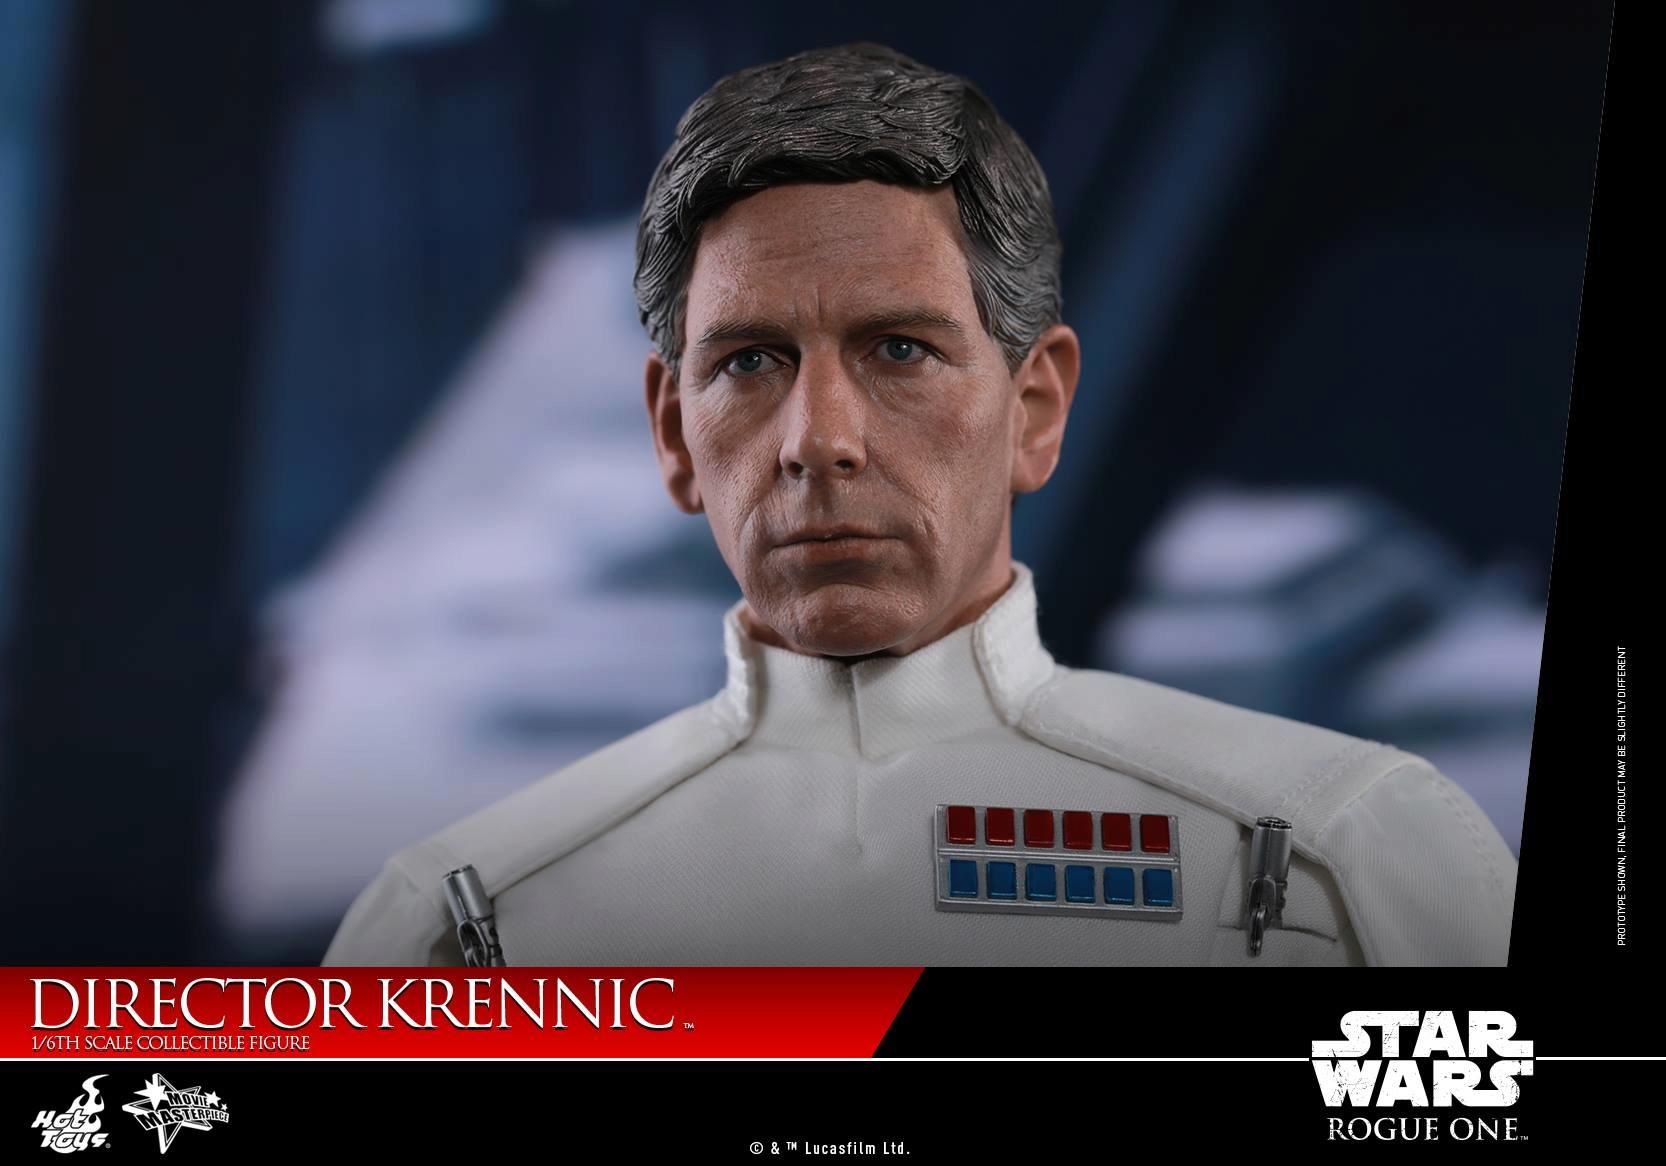 ROGUE ONE : A STAR WARS STORY - DIRECTOR KRENNIC - 10816